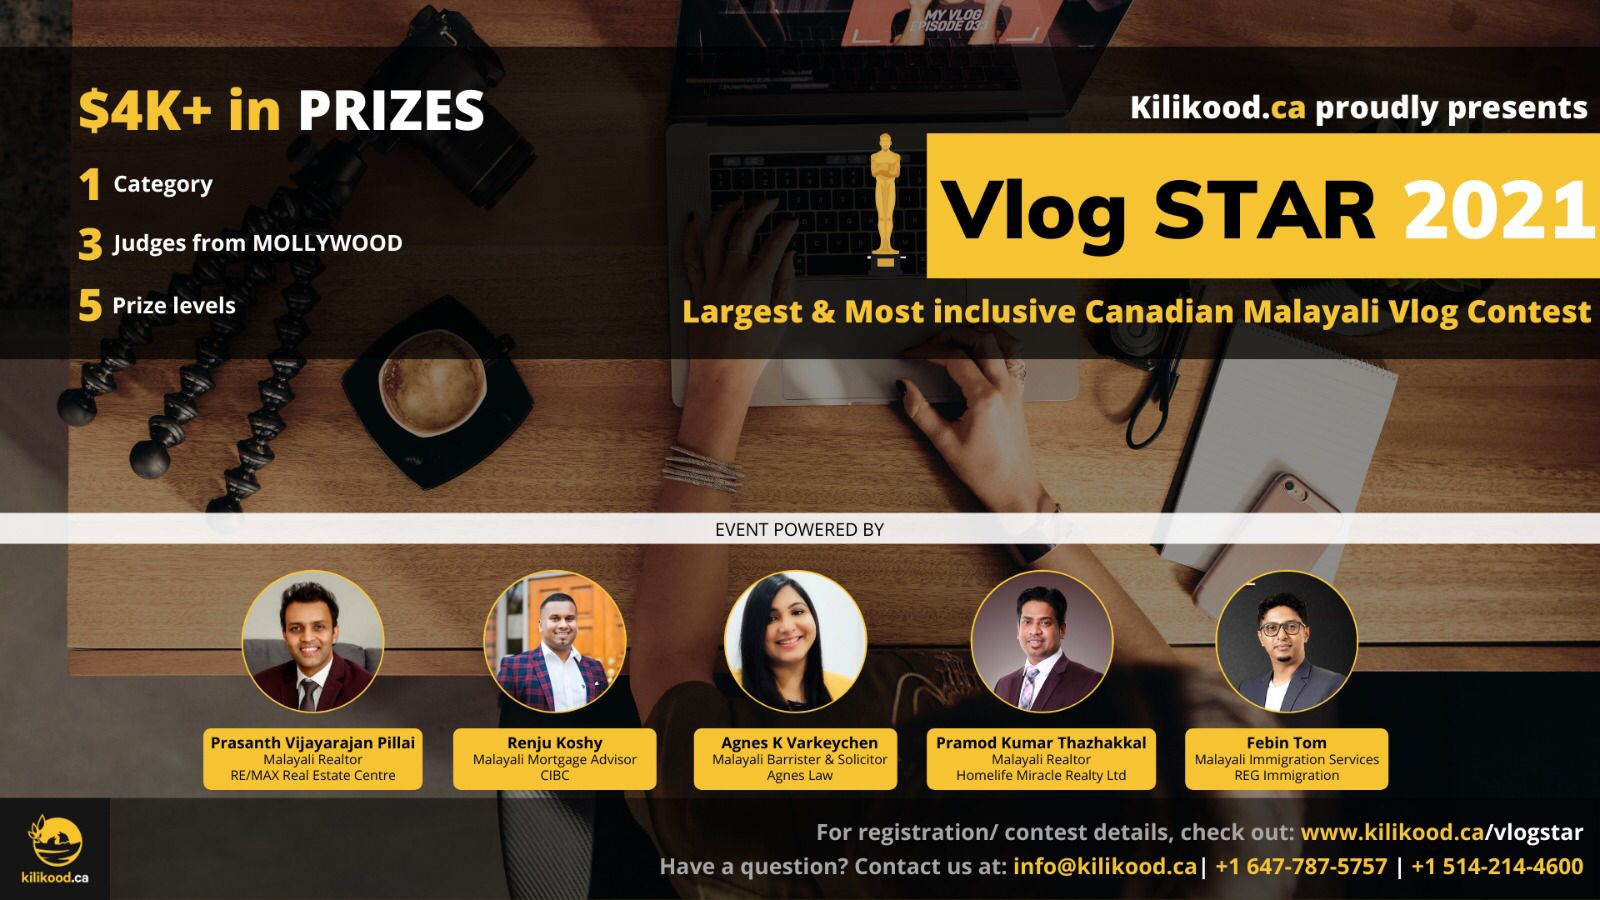 Kilikood.ca Presents VlogStar 2021